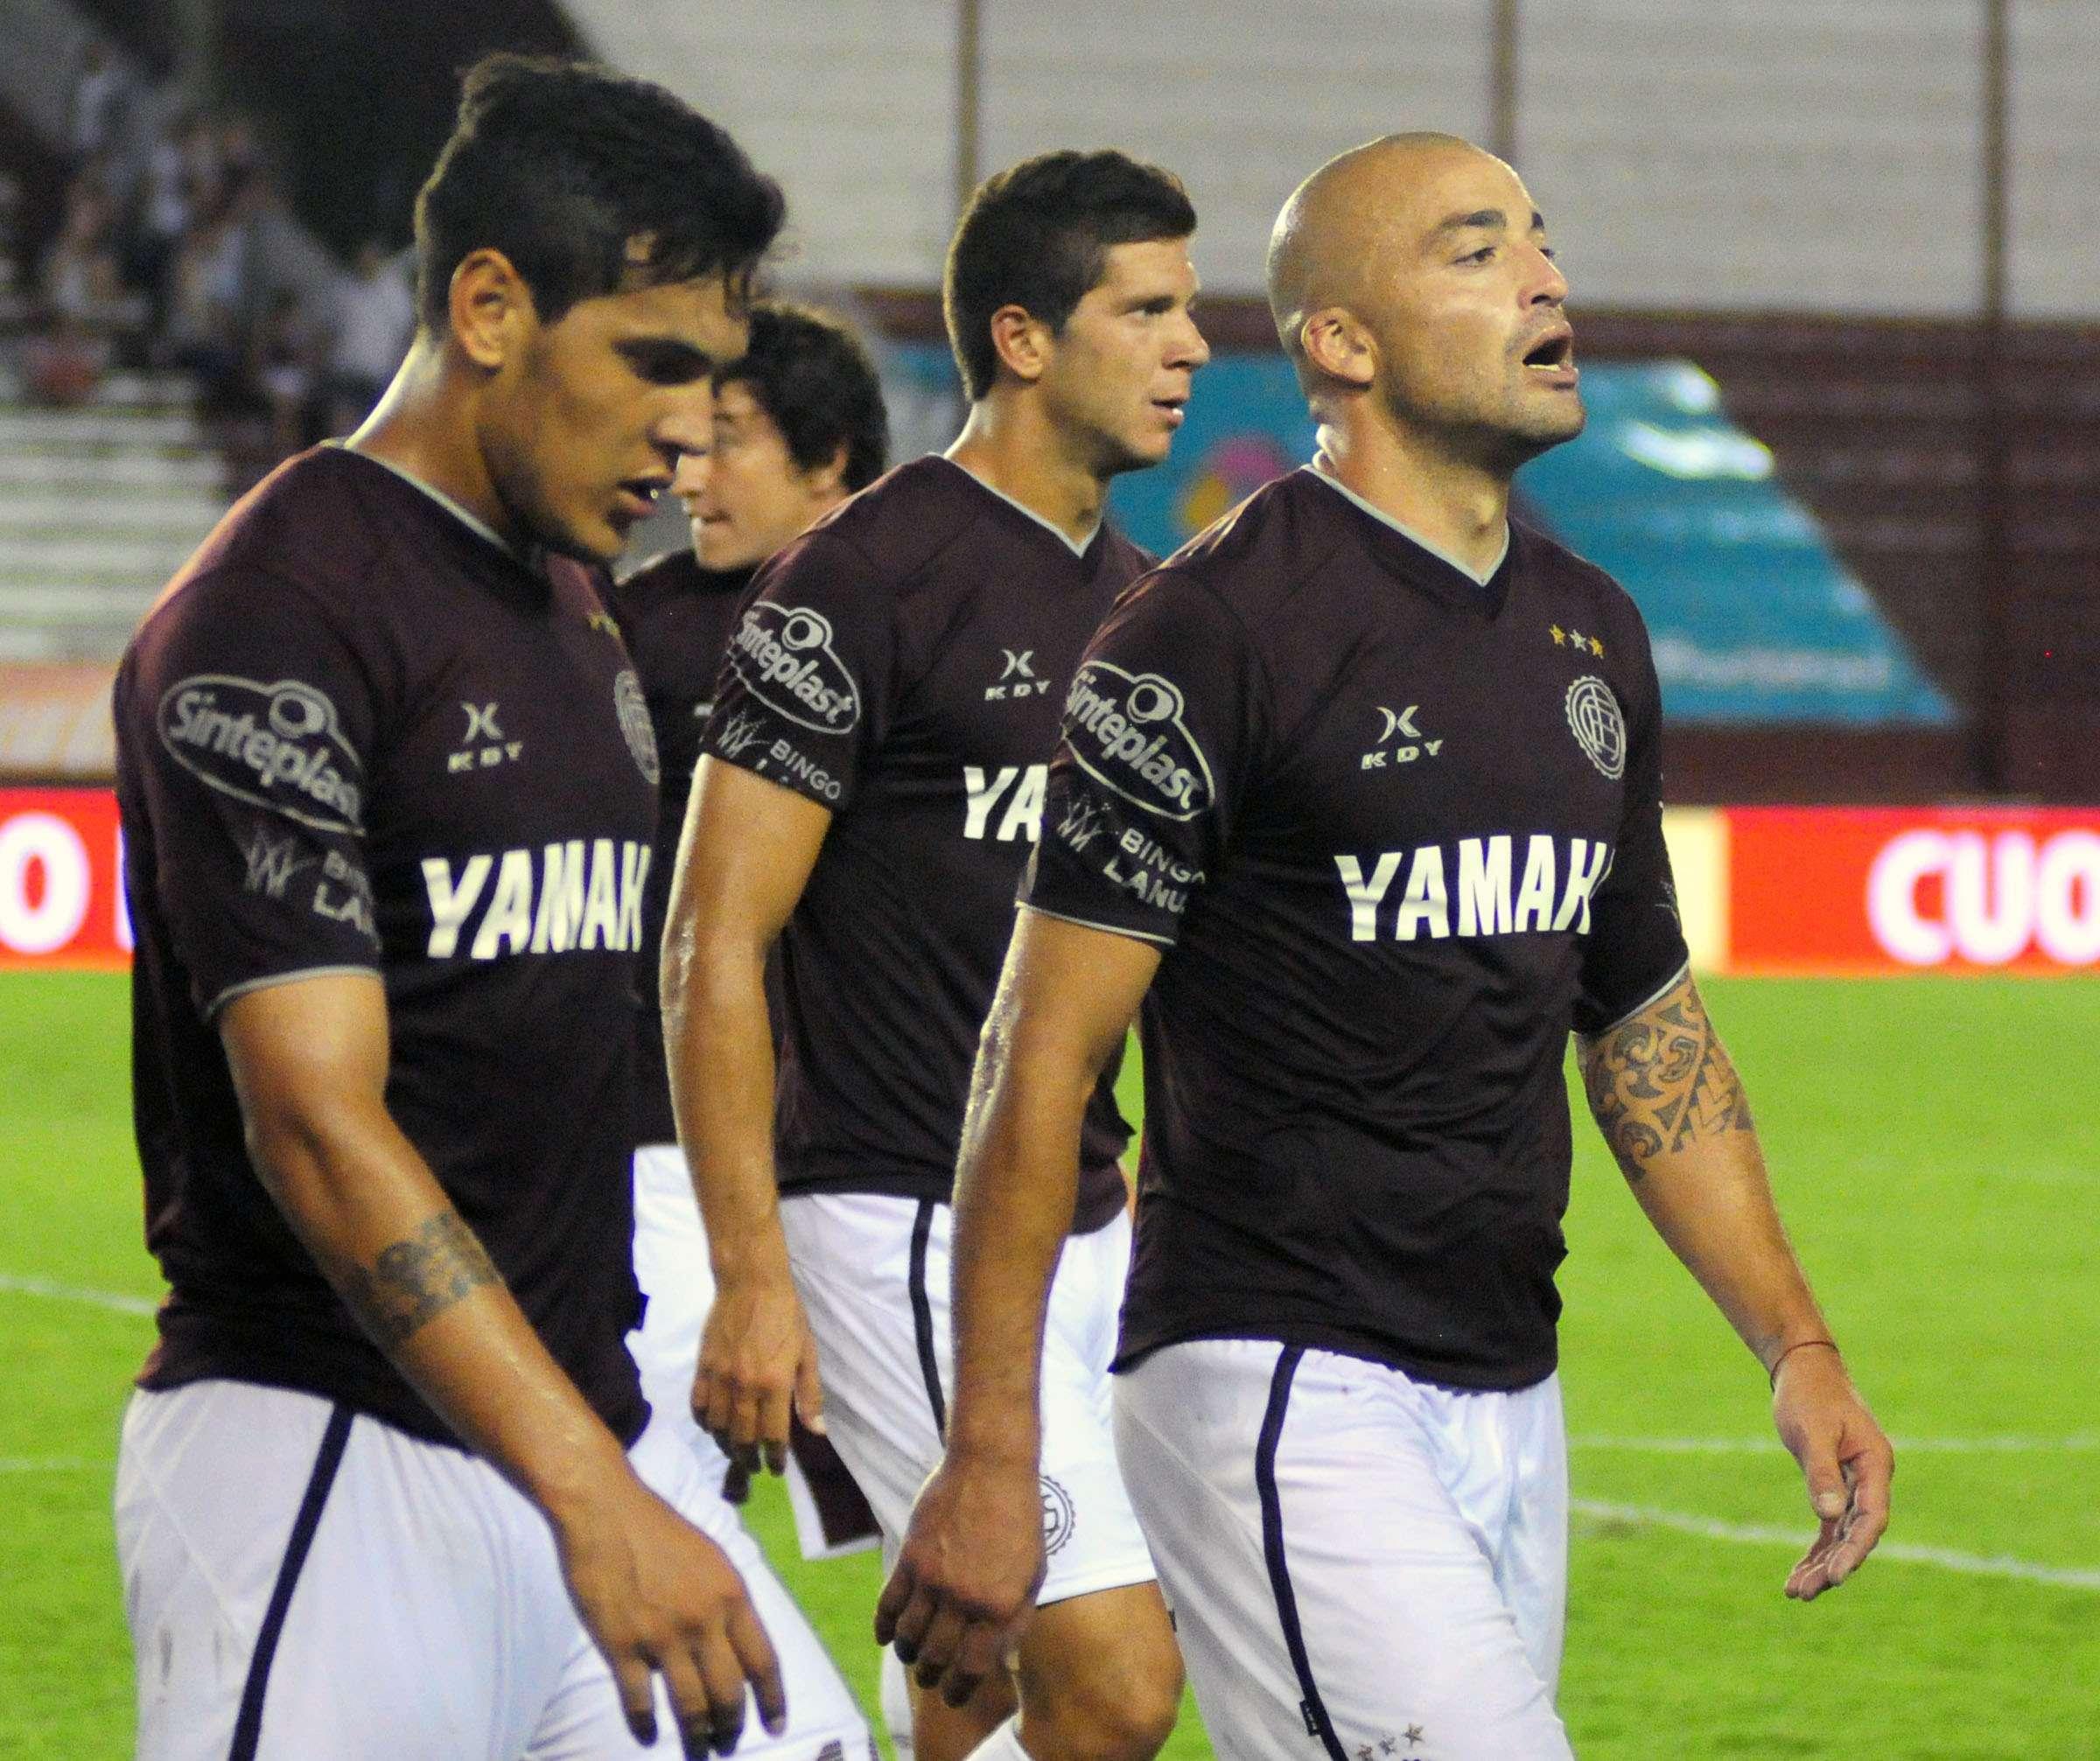 Lanús empató por la segunda fecha del torneo con Belgrano de Córdoba en un pálido 0 a 0. Foto: NA